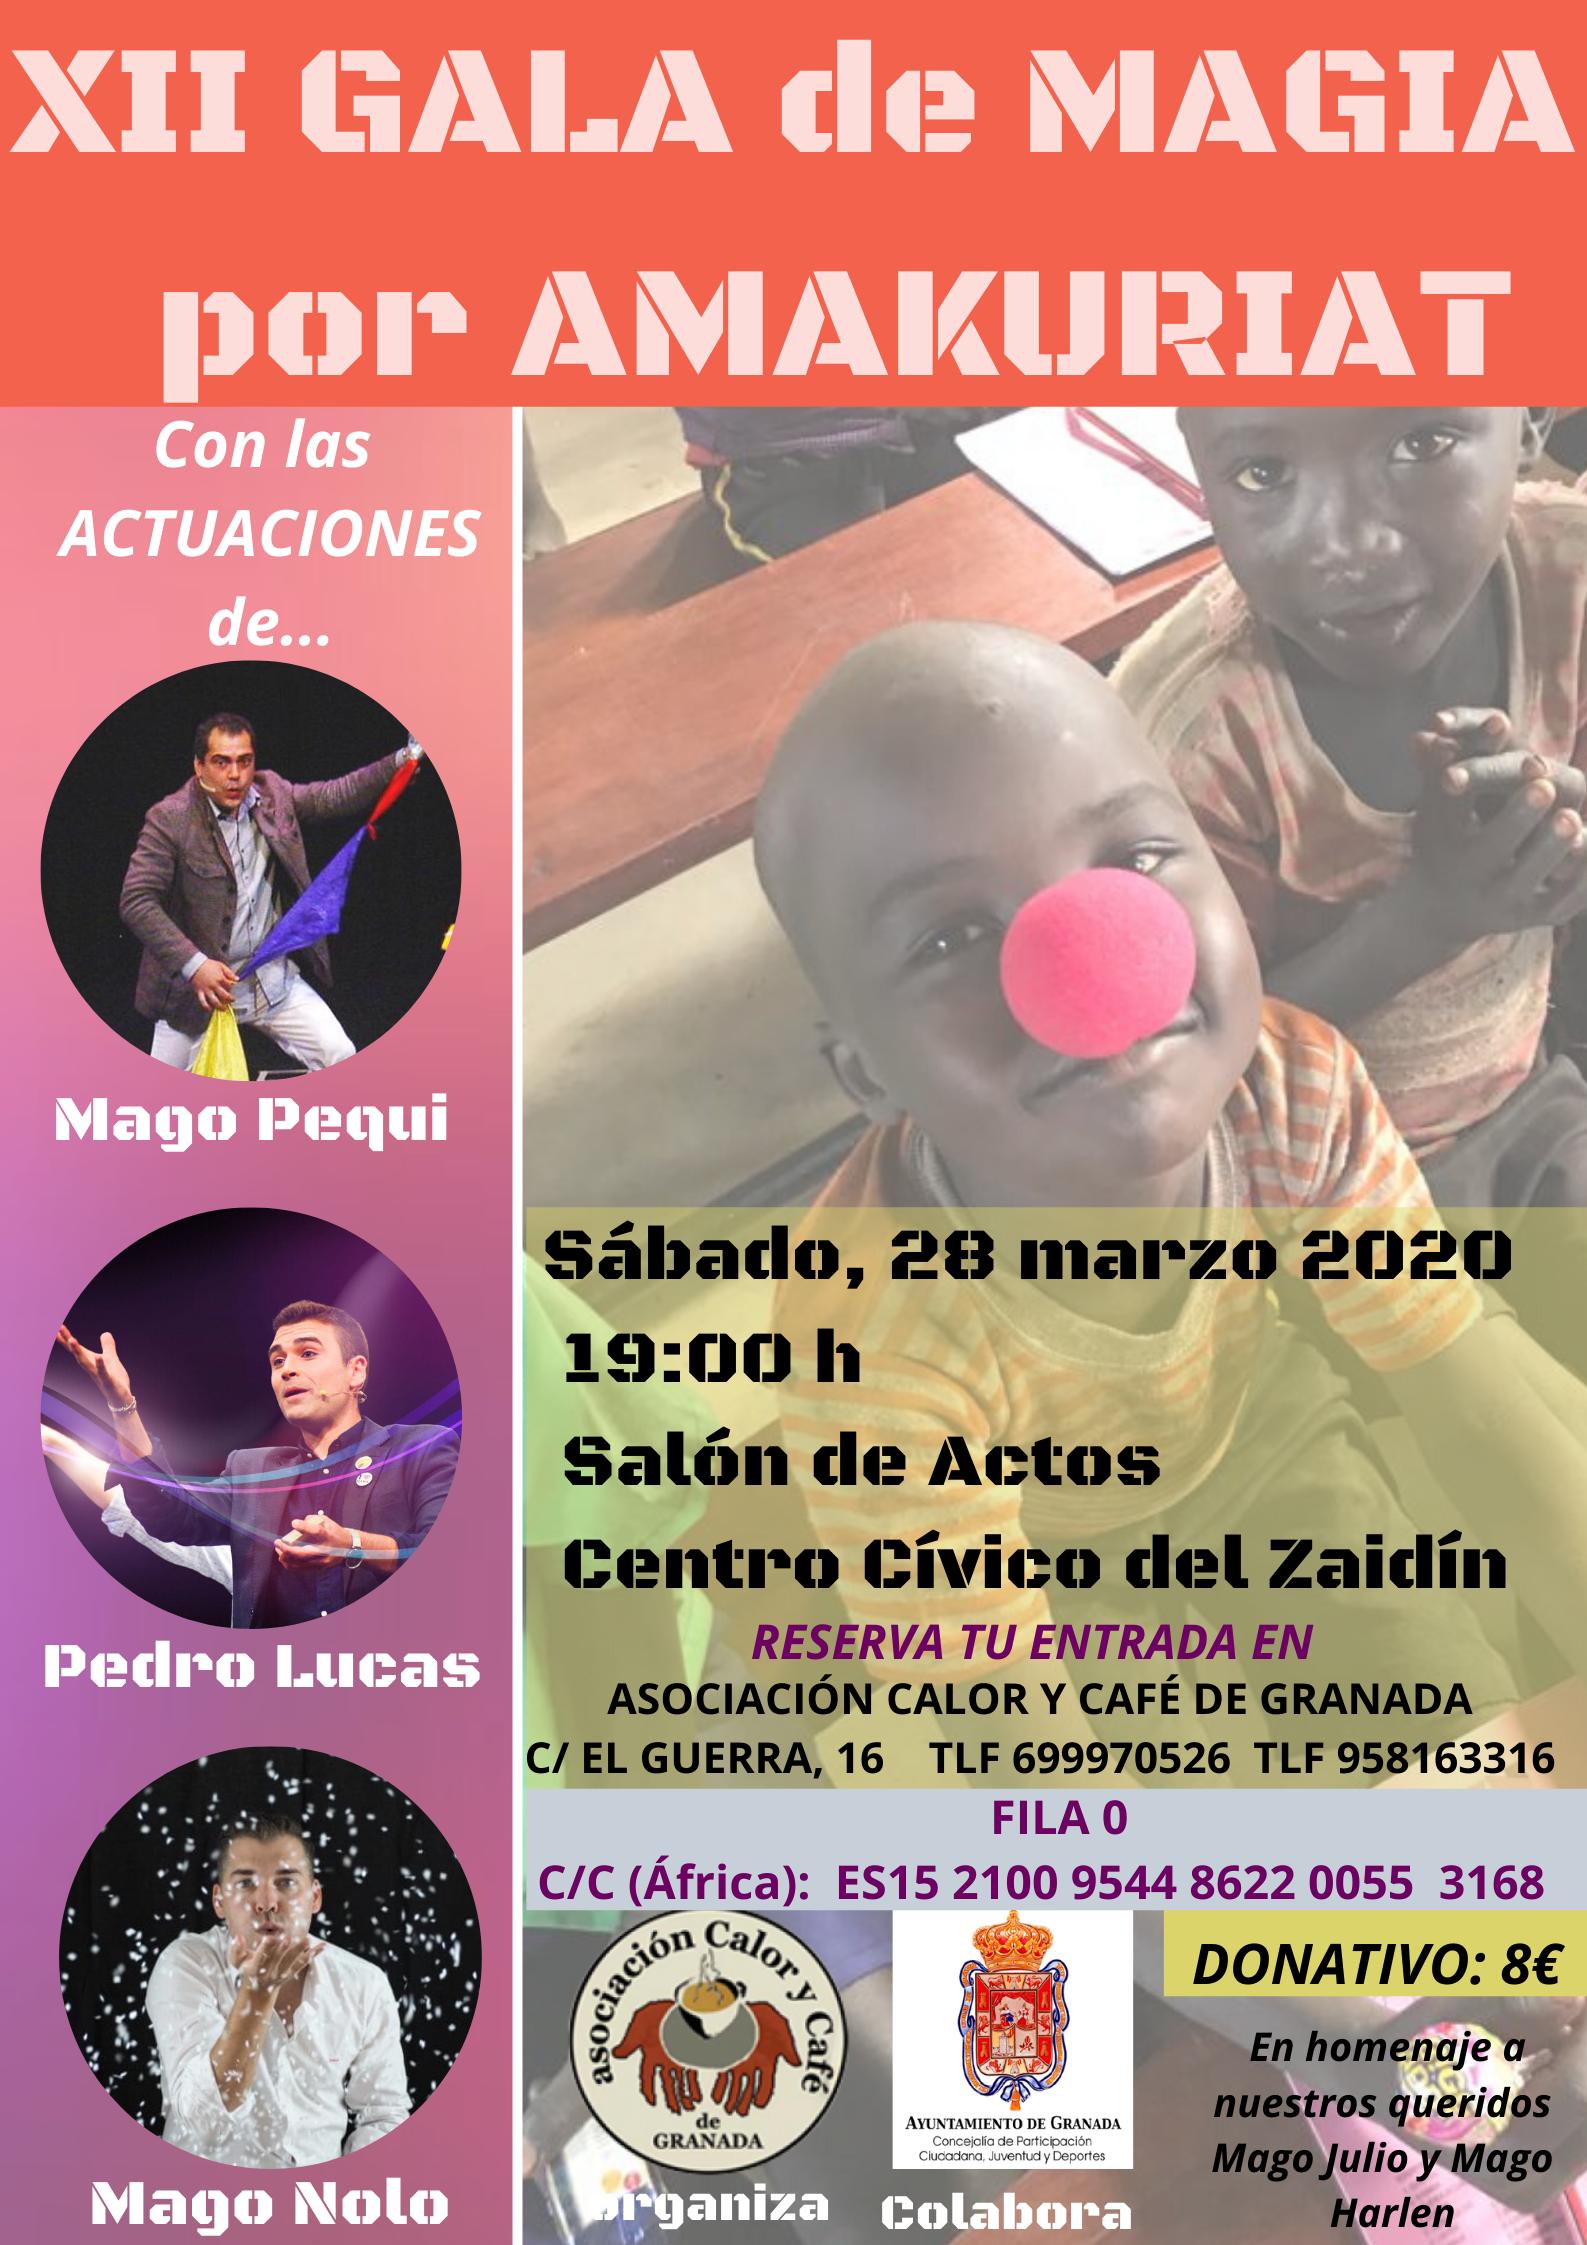 XII GALA DE MAGIA POR AMAKURIAT, 2020